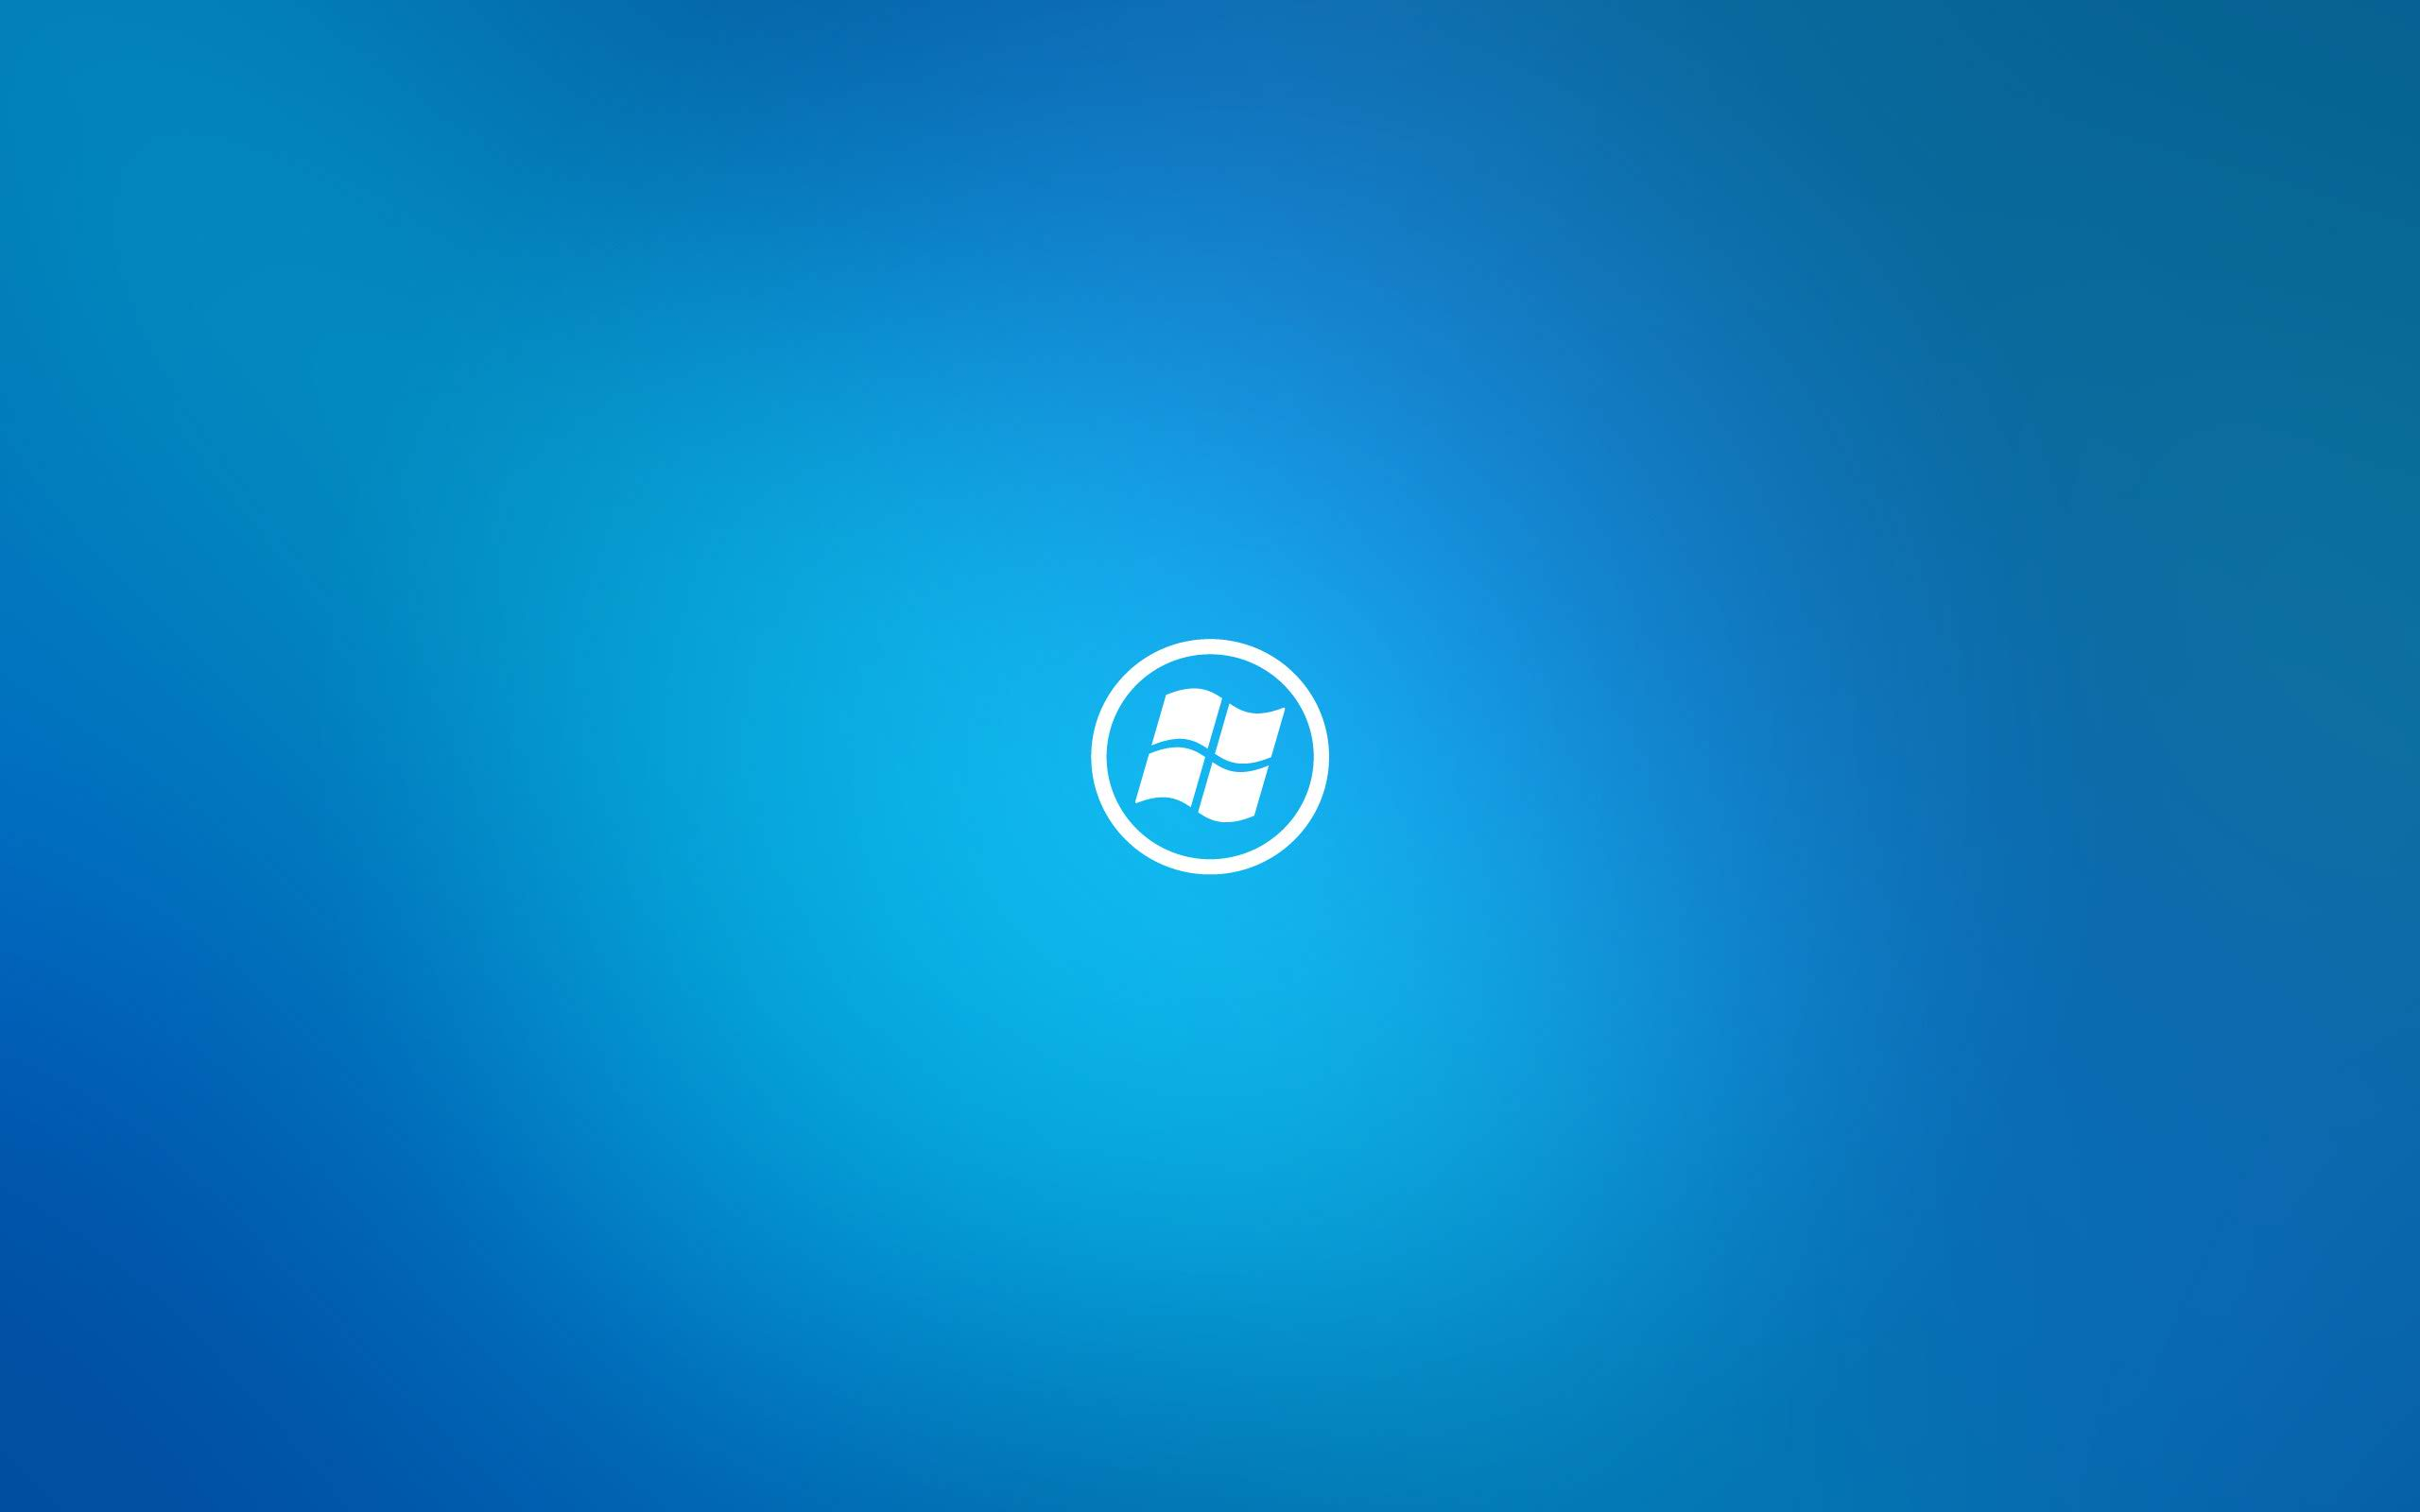 Logo Windows Wallpaper